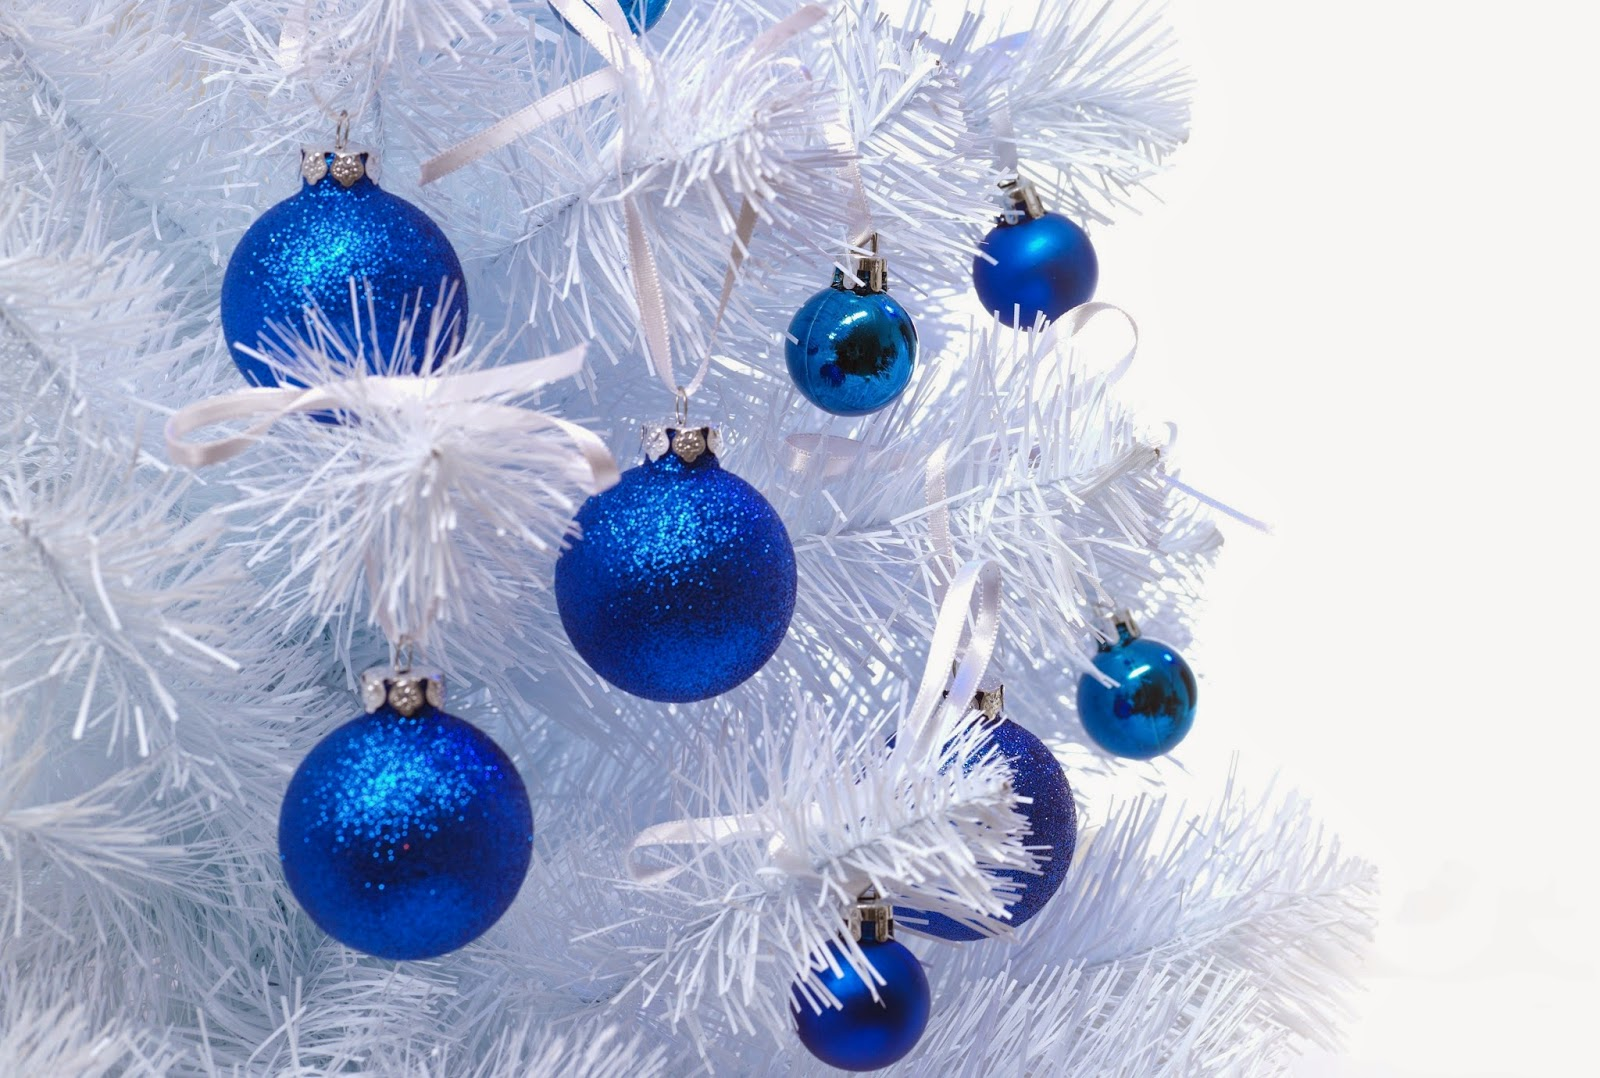 blue christmas baubles decoration ideas for white christmas - White Christmas Tree With Blue Decorations